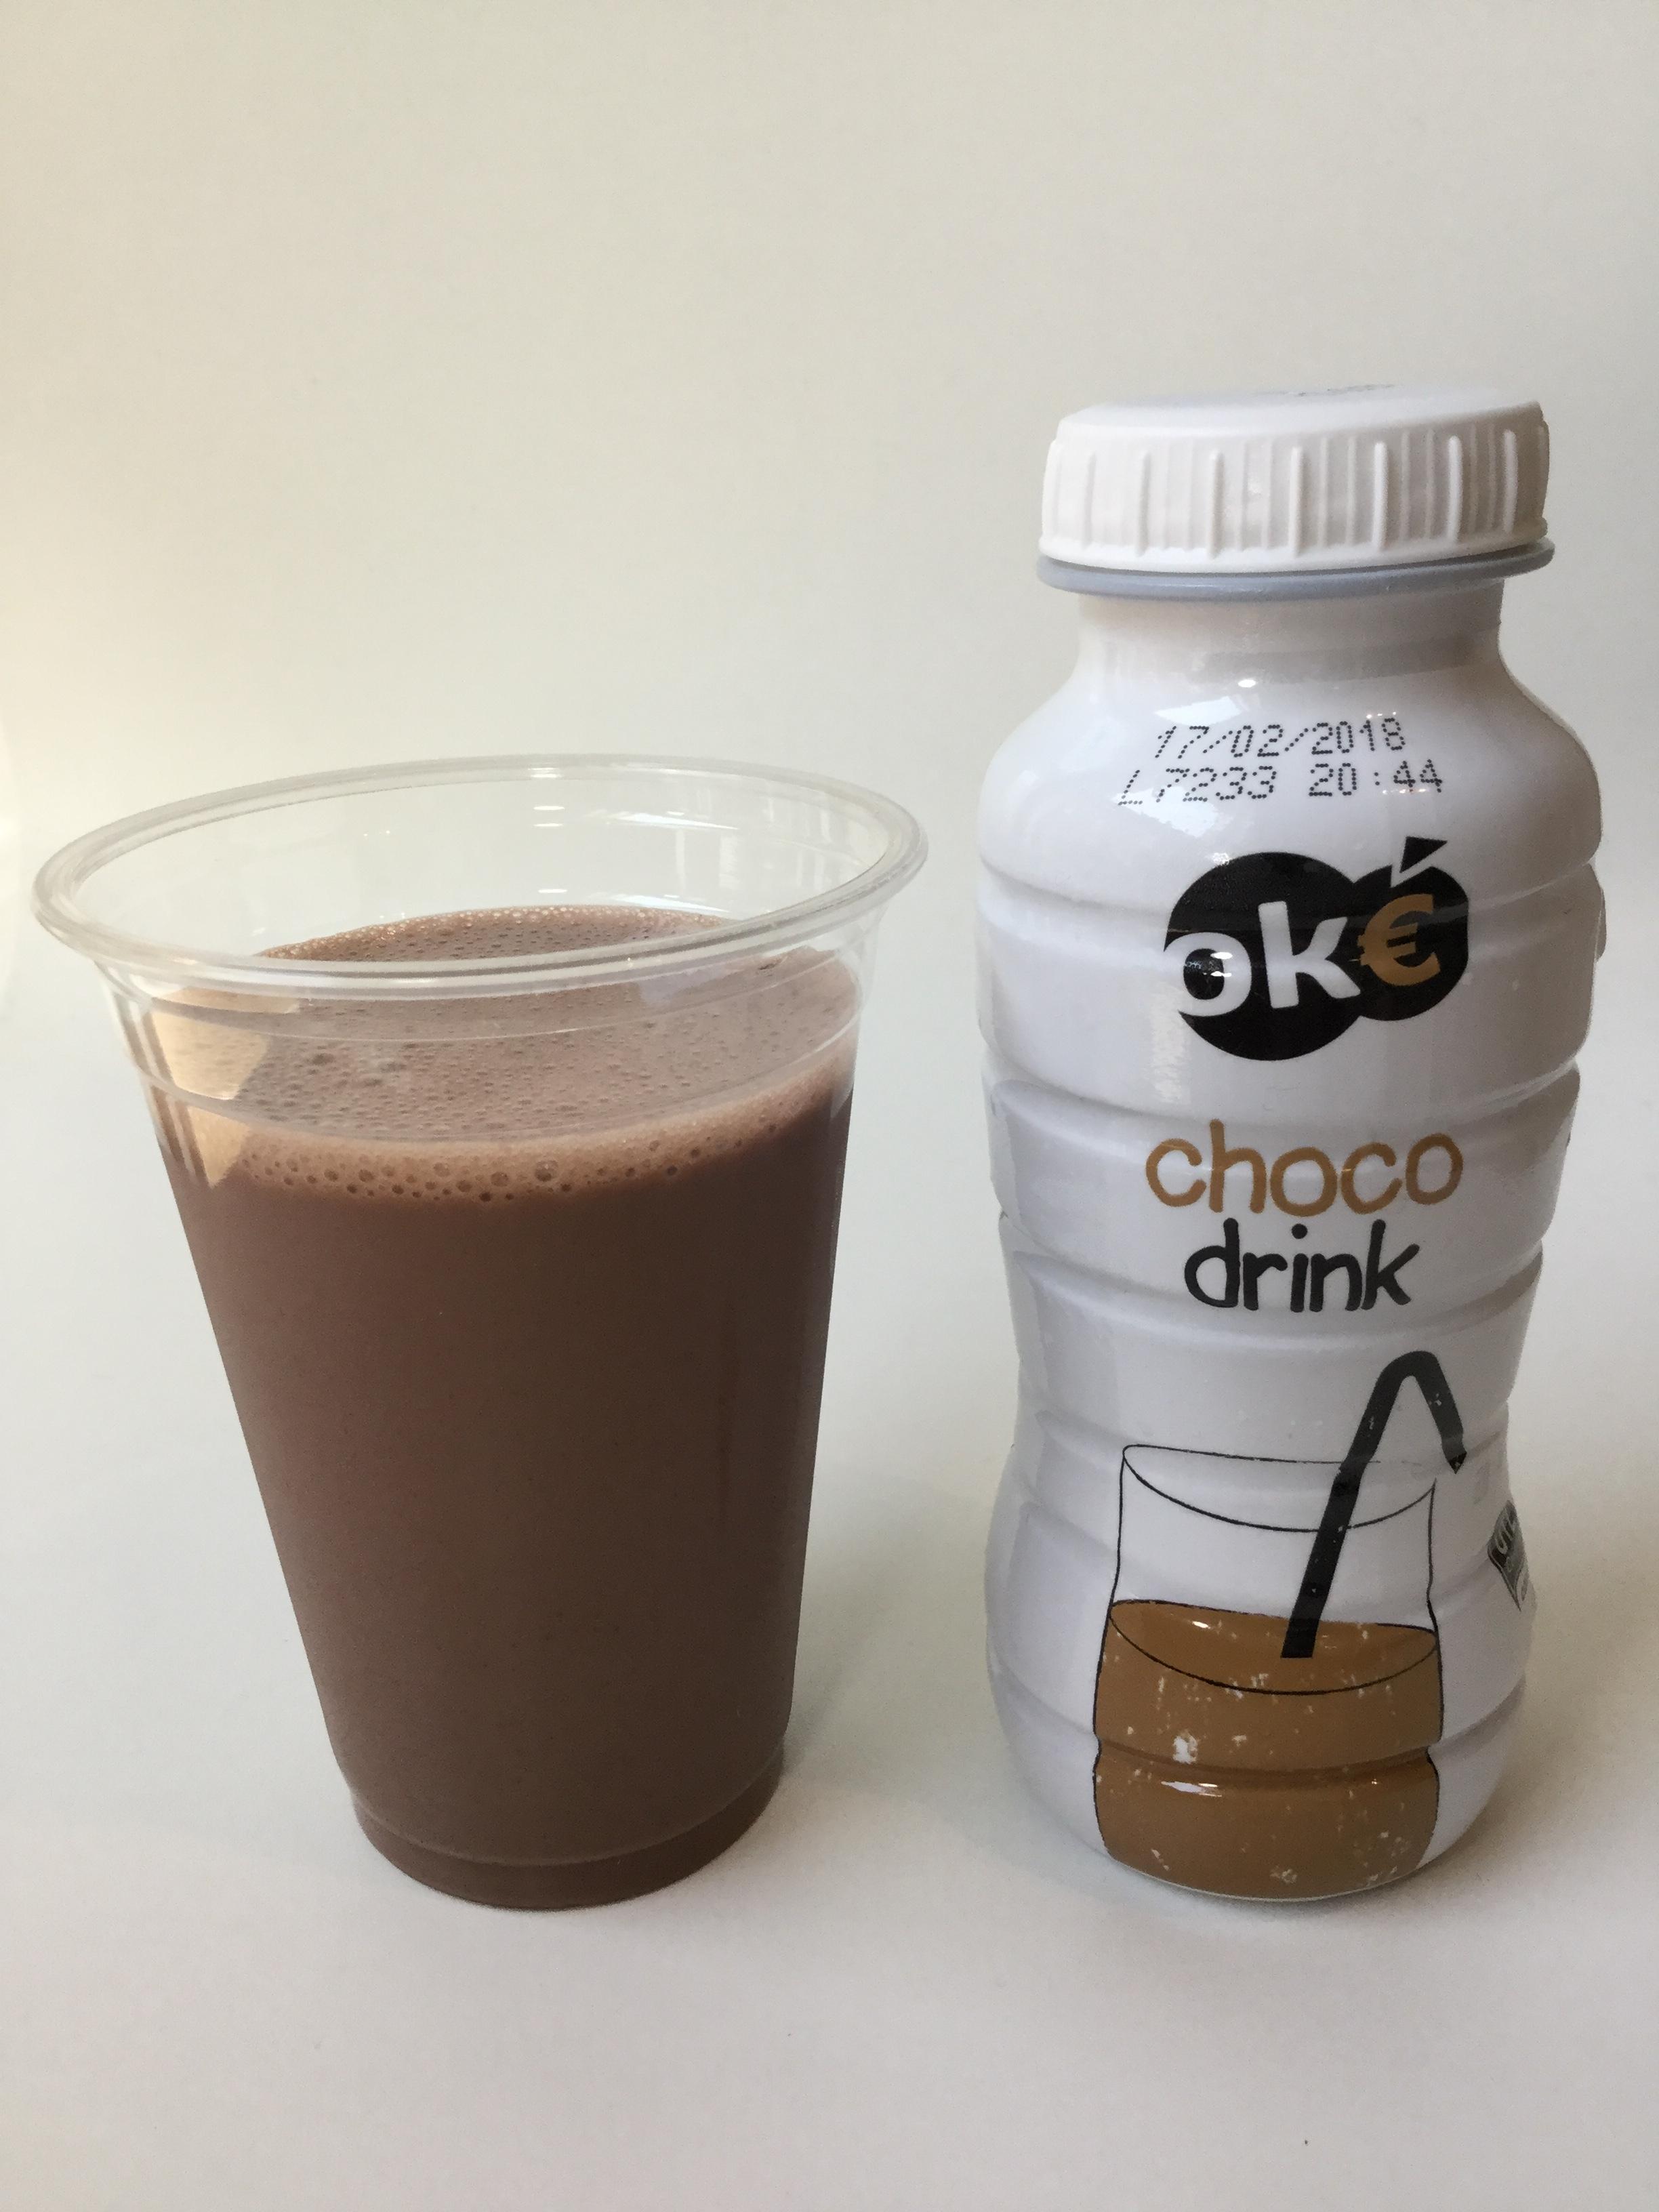 OK€ Choco Drink Cup